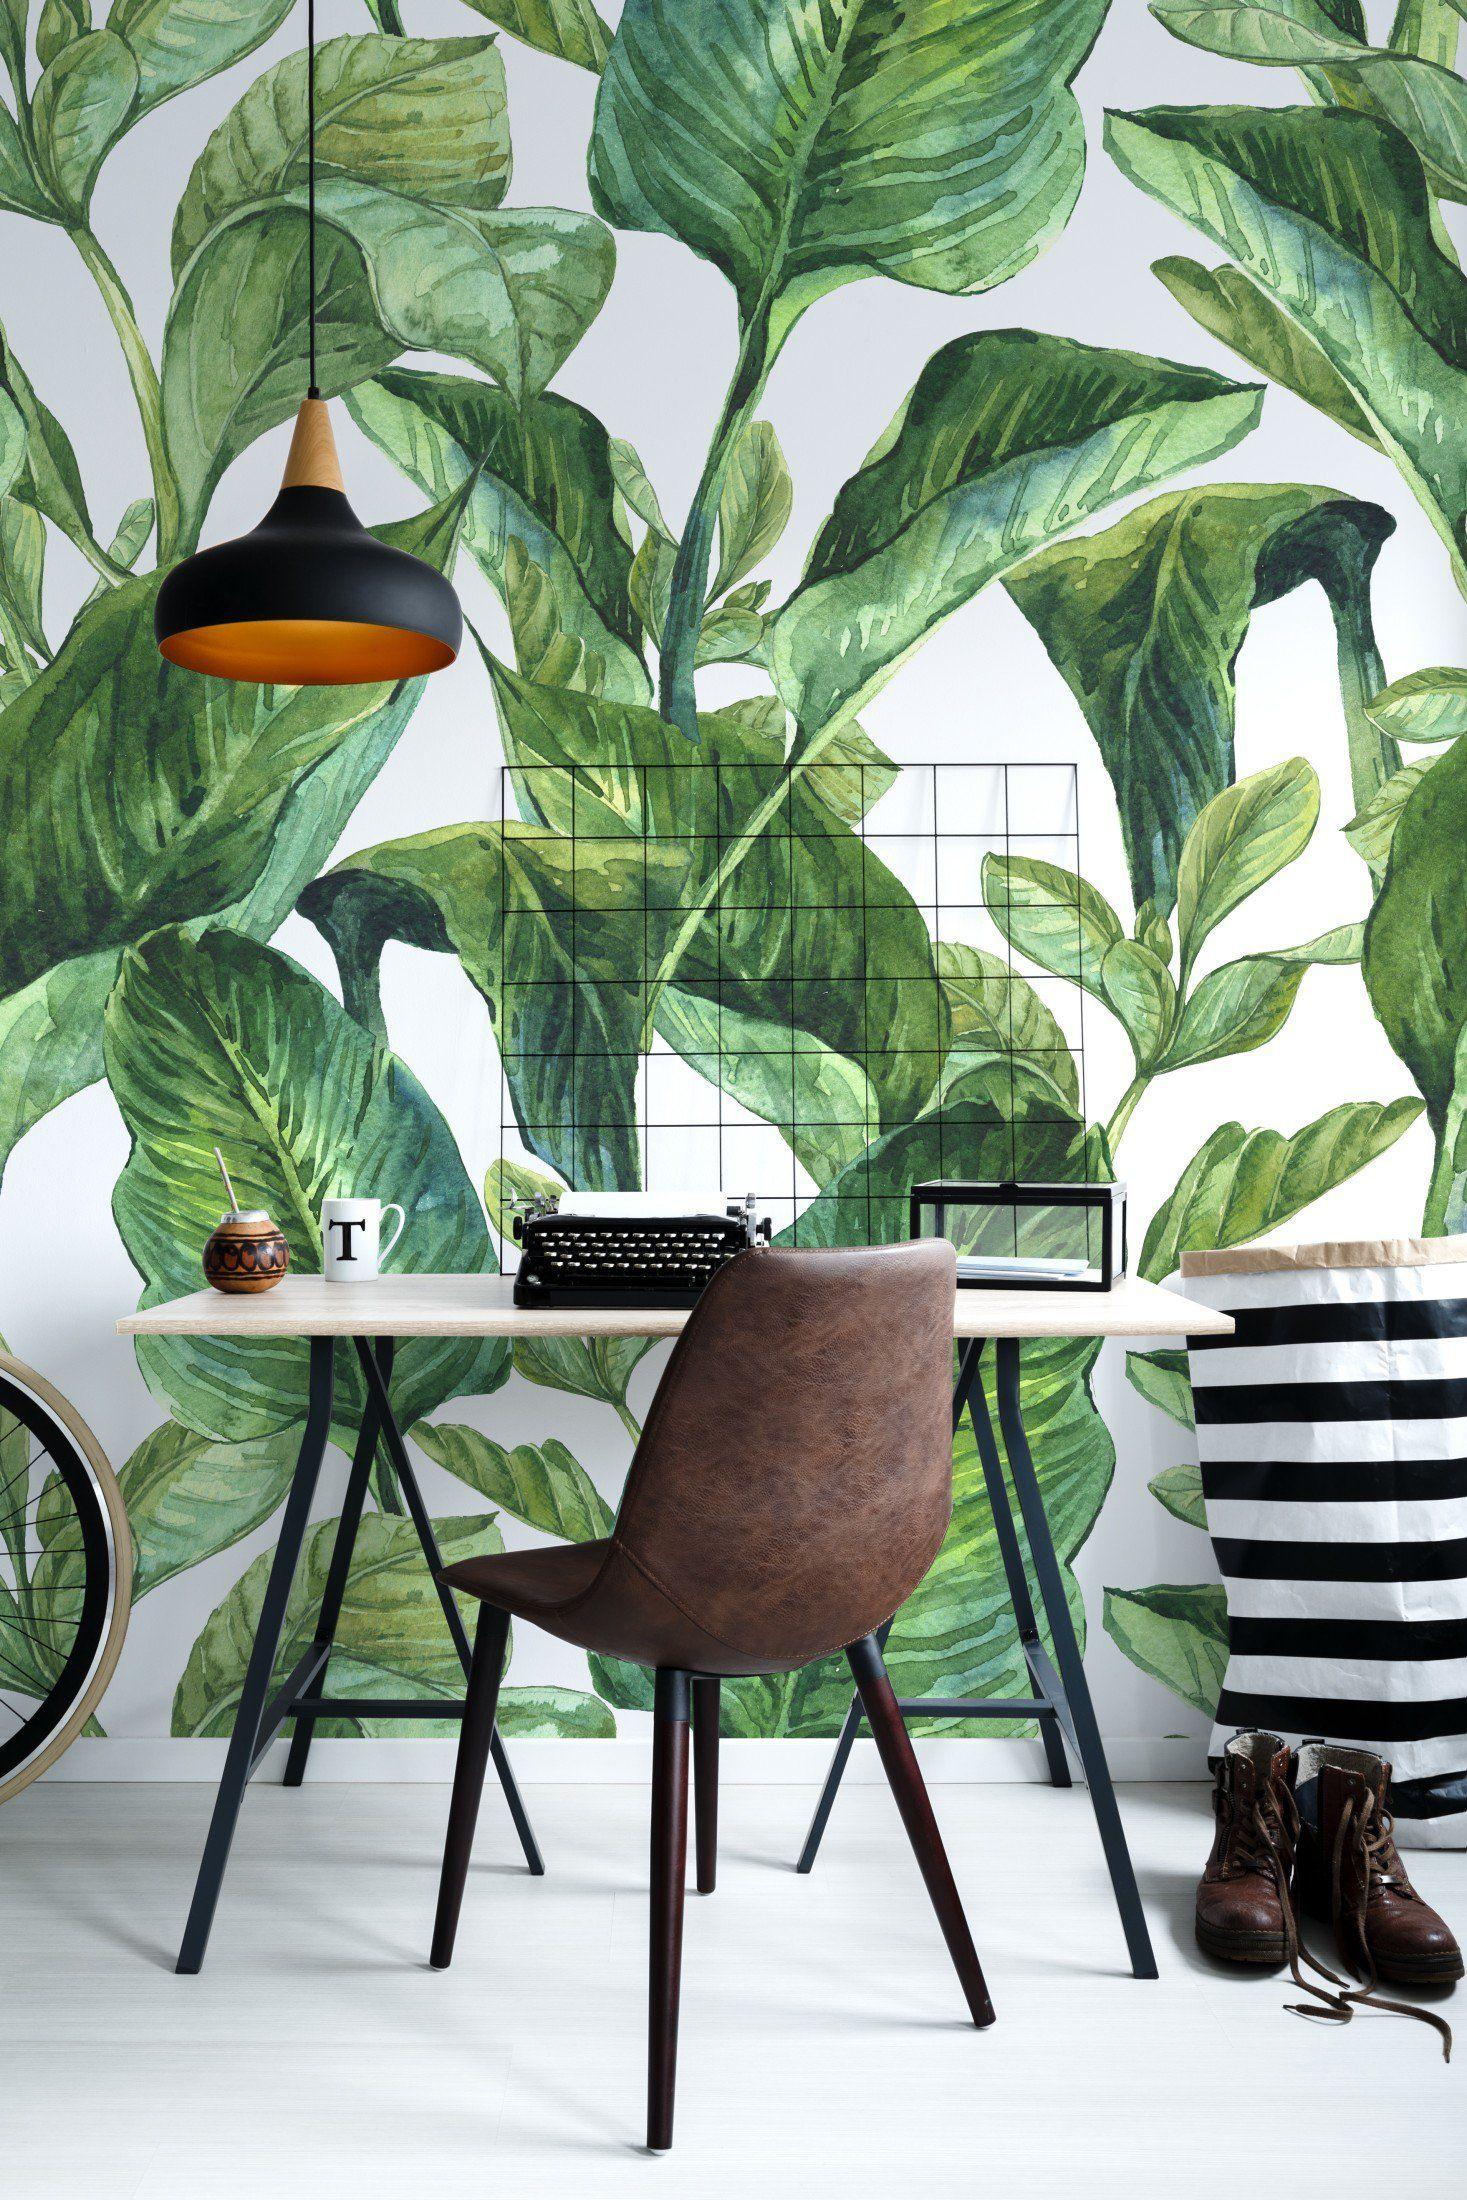 Diy Geek Wall Decor Wild Life Flower Ideas For Half Baths London Phone Booth